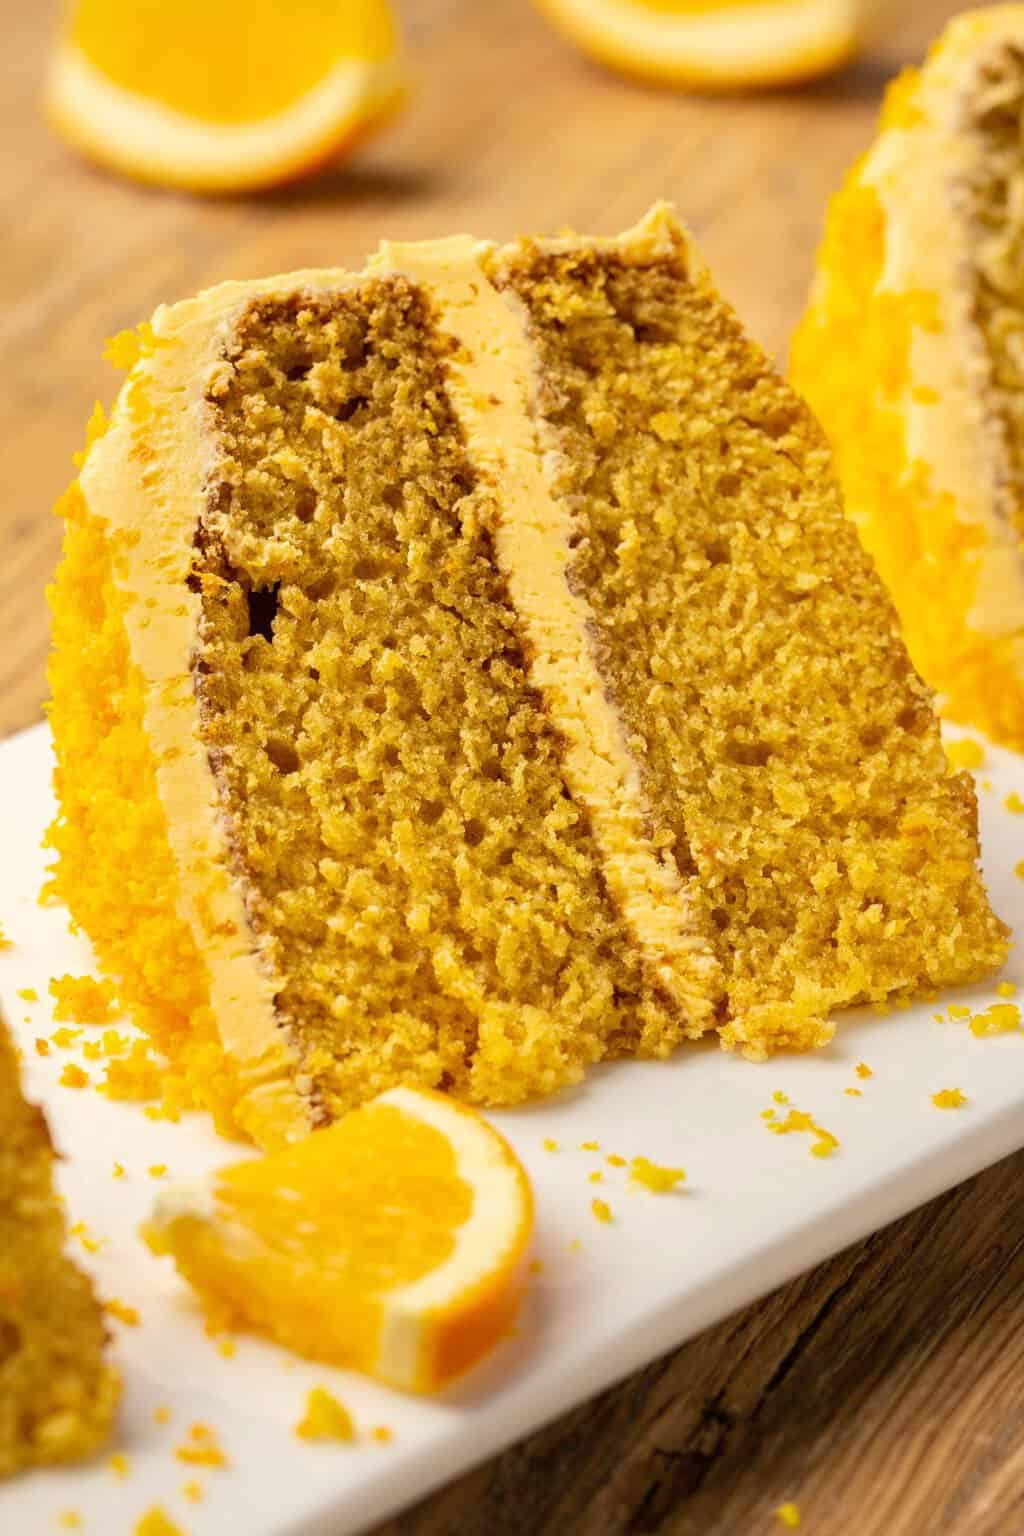 Slice of vegan orange cake on a white plate.